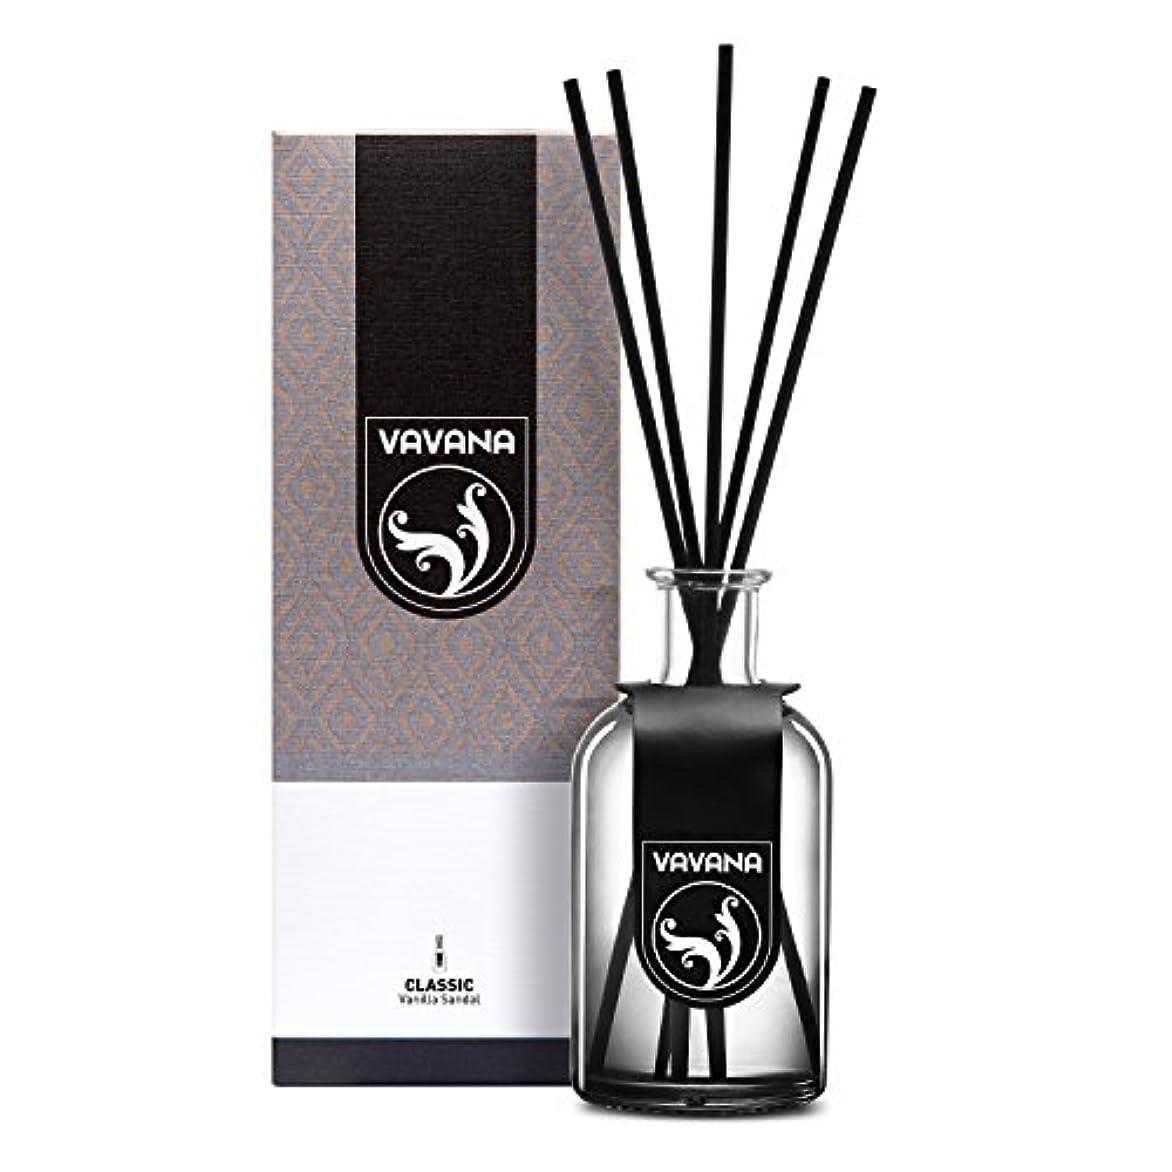 Vavana アロマセラピーディフューザースティック リードディフューザーセット アロマホームフレグランスセット エッセンシャルオイルディフューザースティック 天然の香りのオイルブレンド製